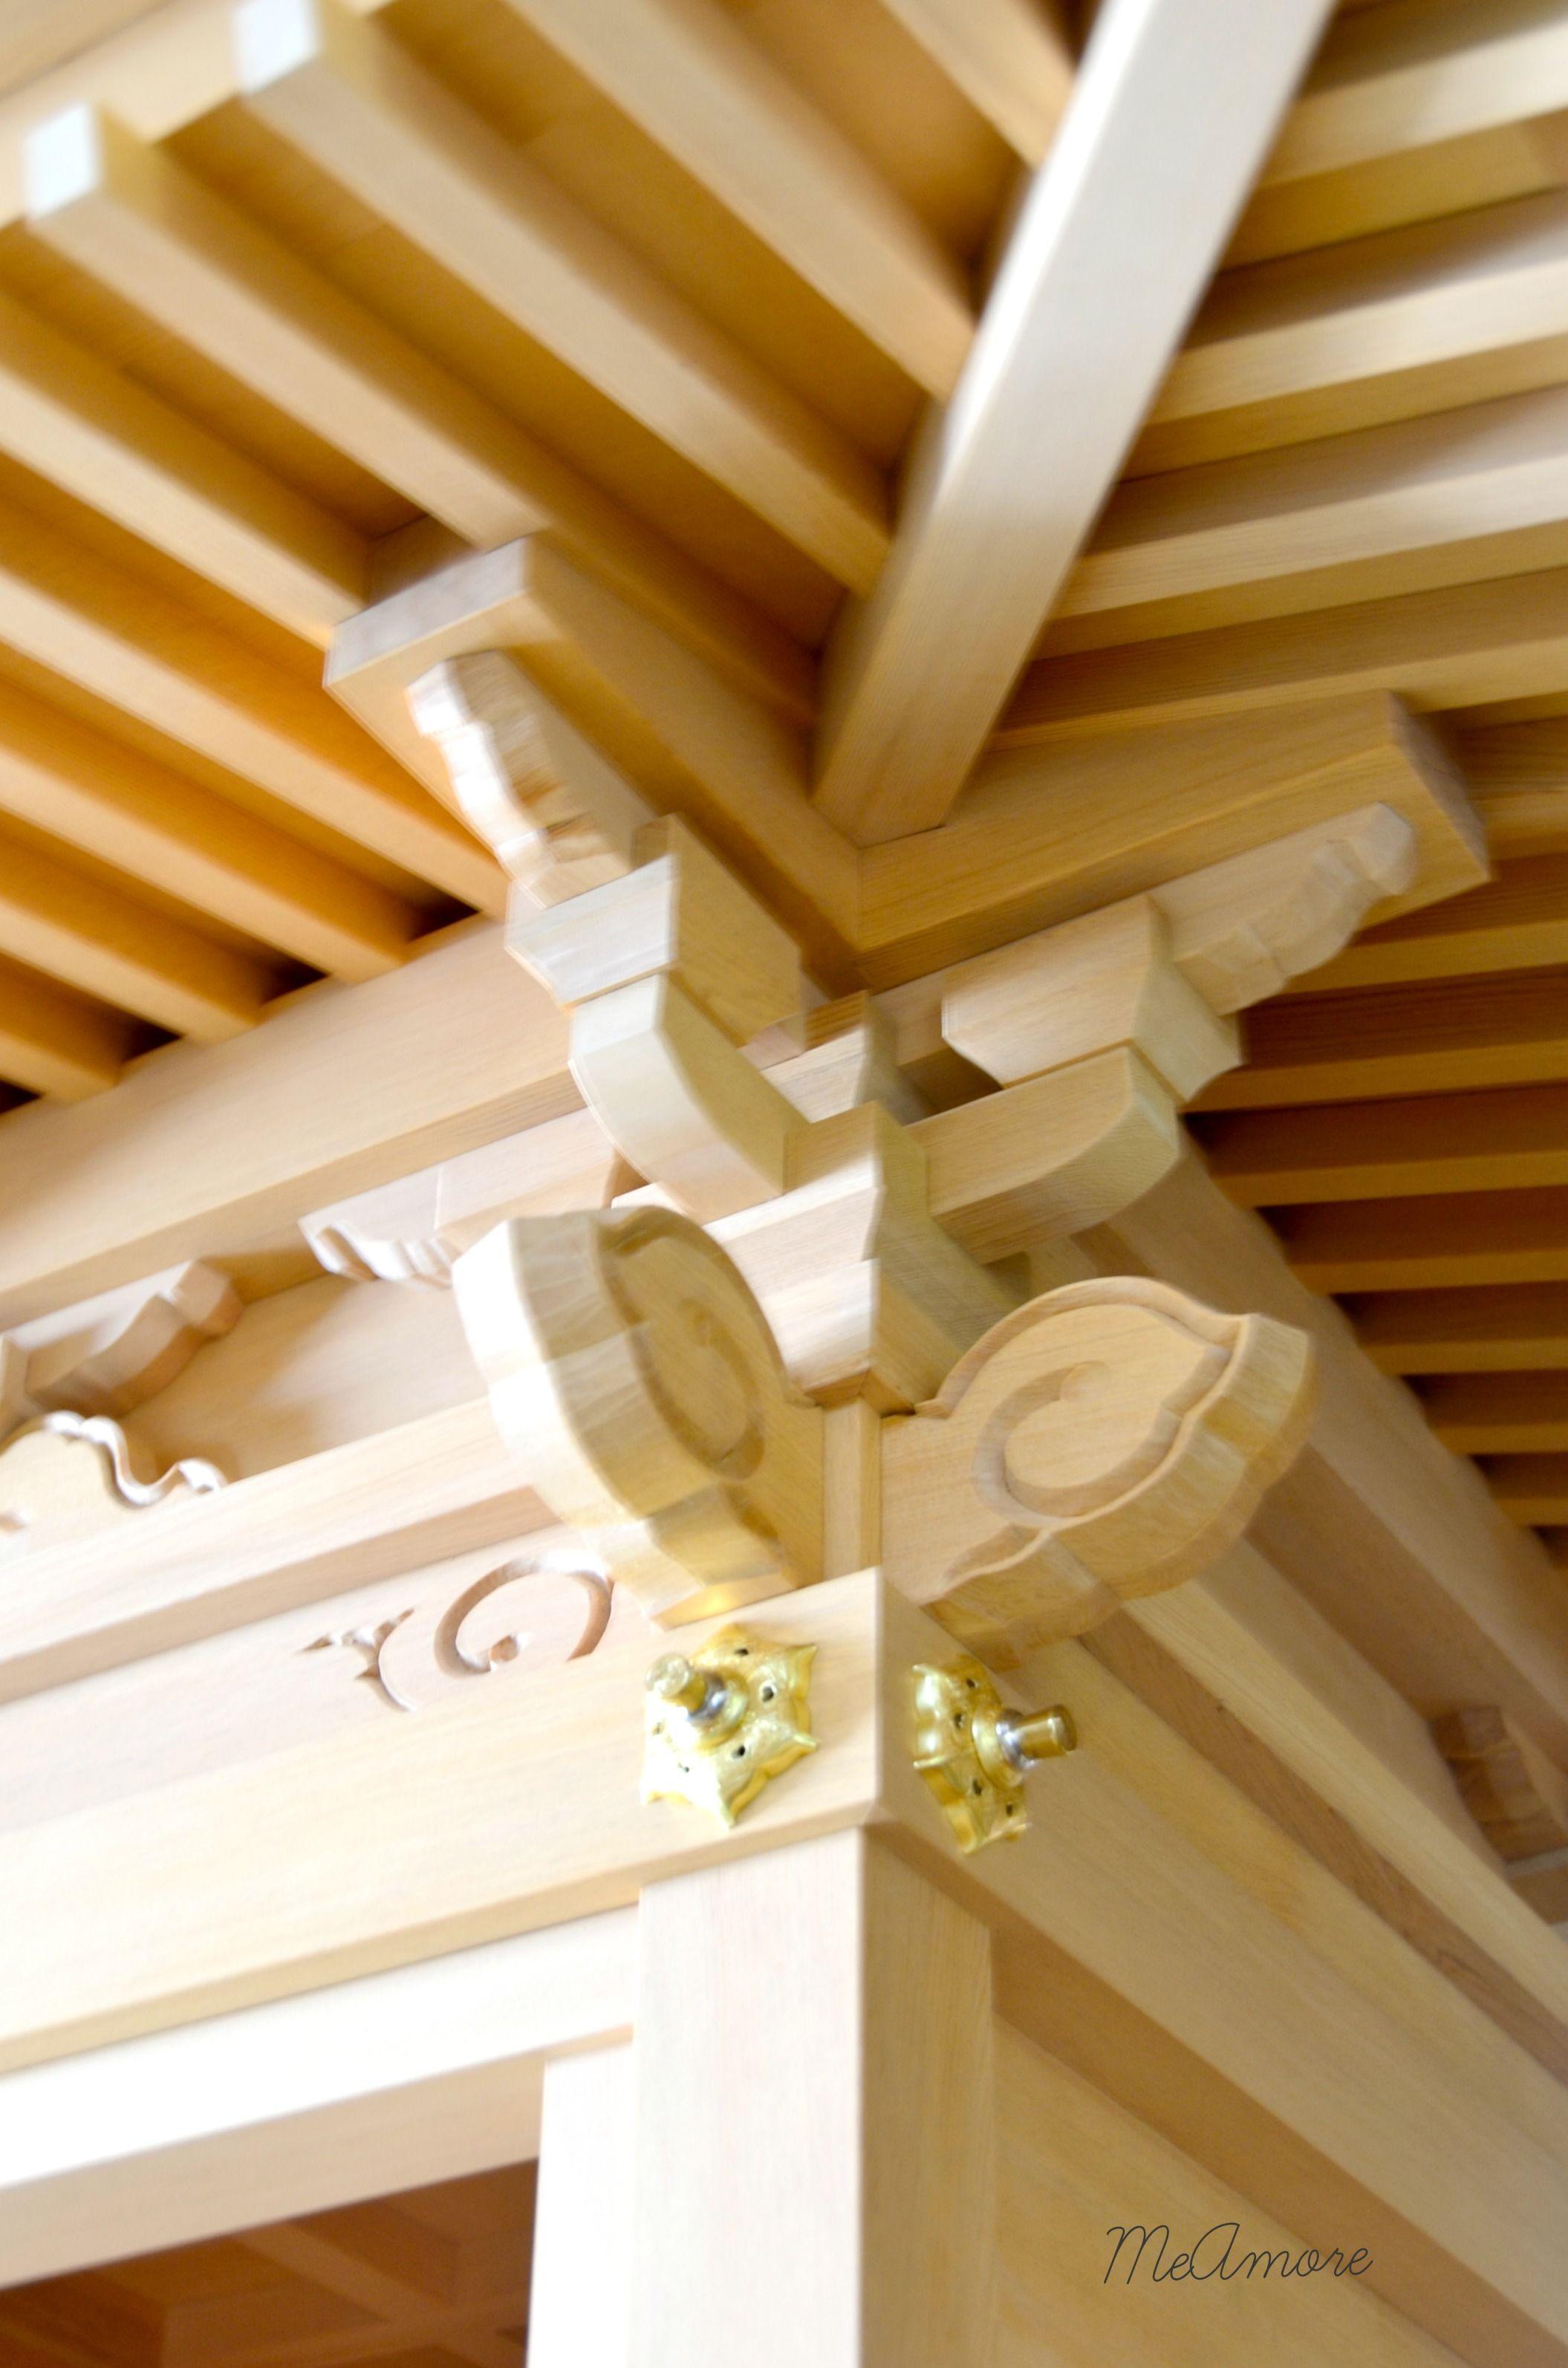 Japanese Architecture Japanese Architecture Architecture Awards Architecture